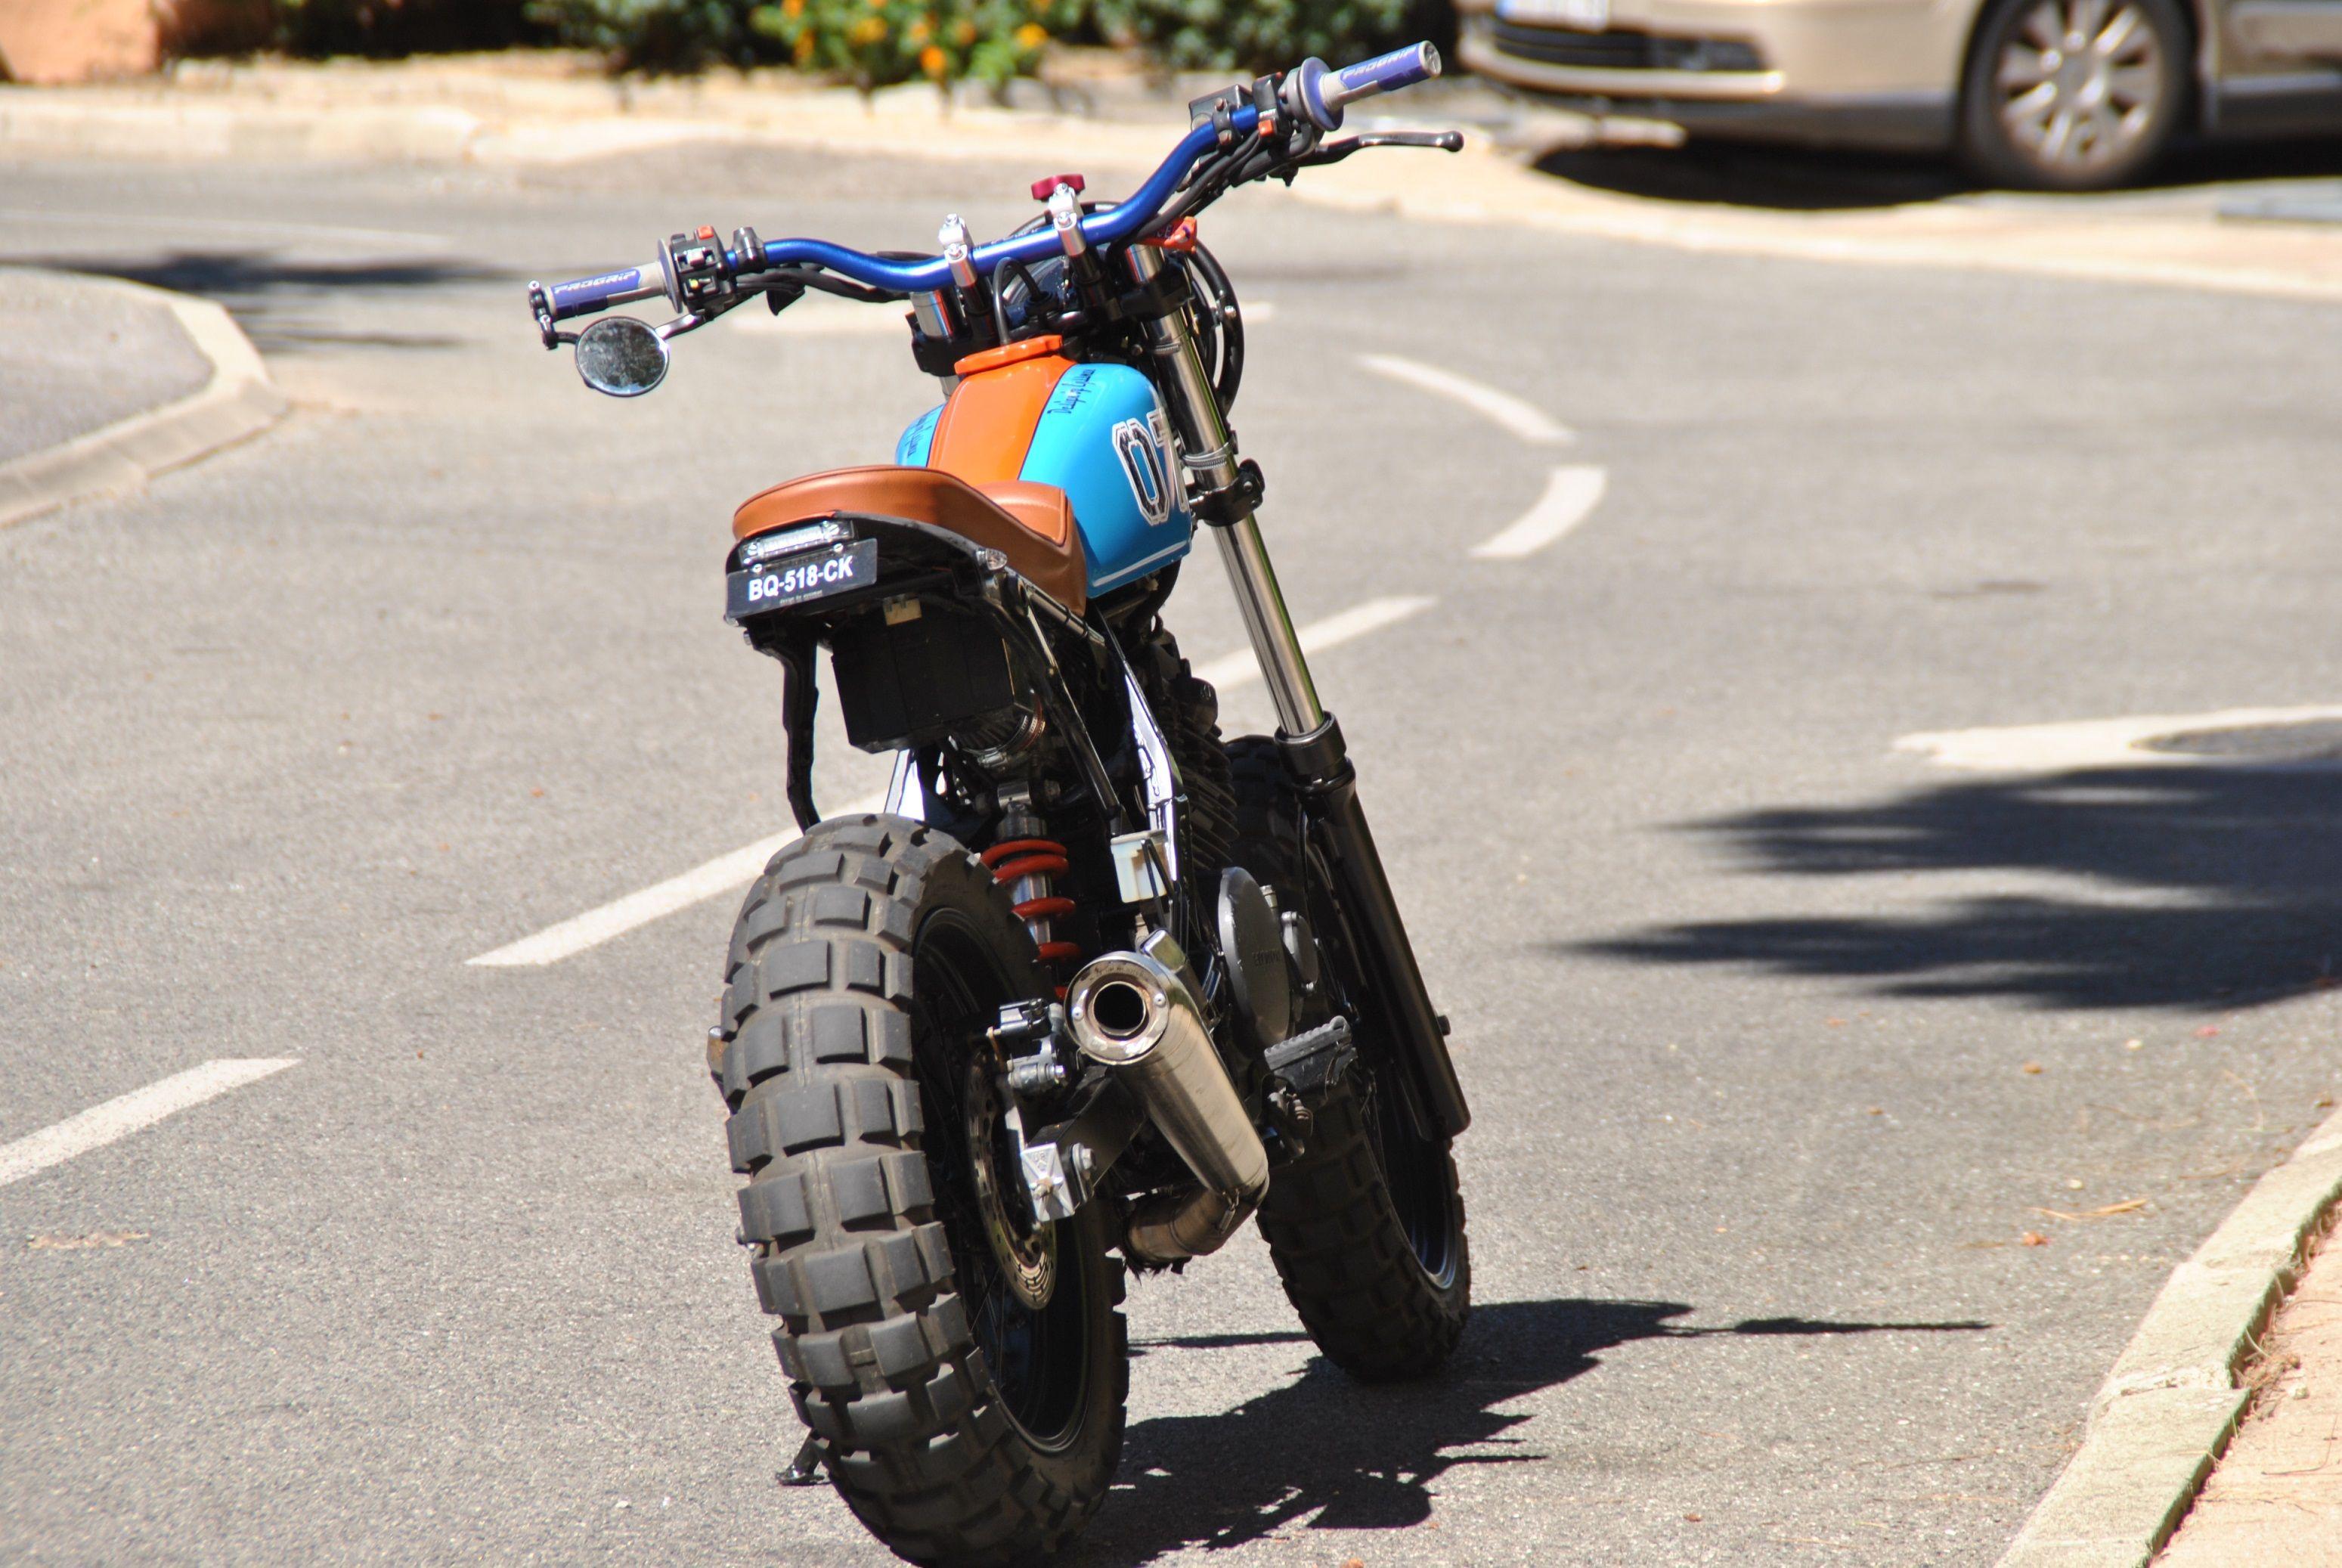 Honda dominator nx project # 1 by eyss-corp scrambler - street tracker